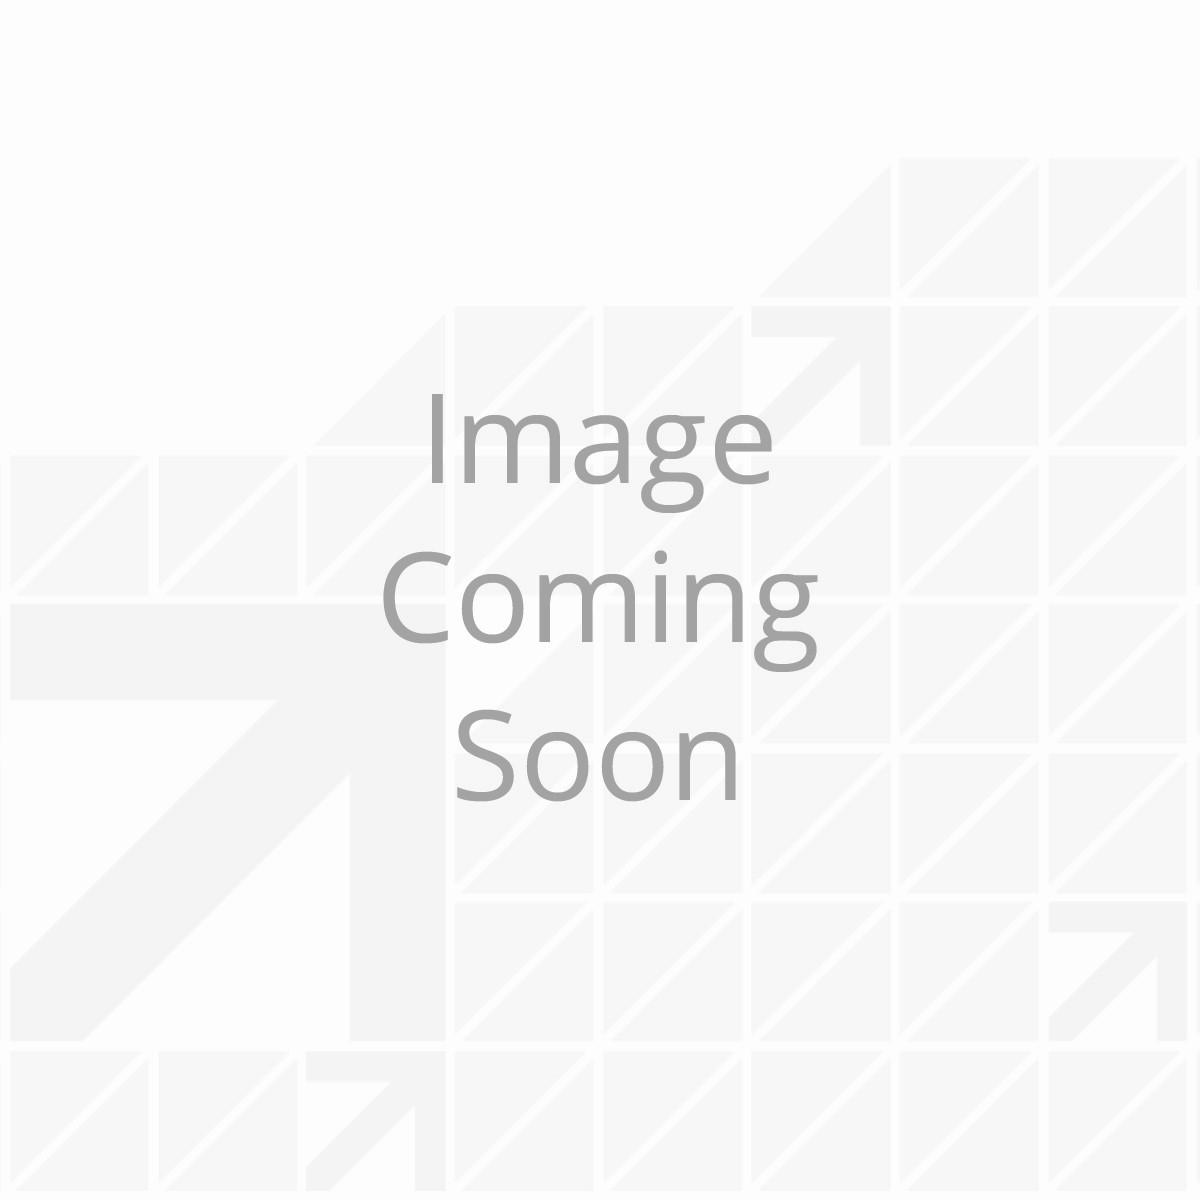 30A Heavy-Duty Cordset - Various Options